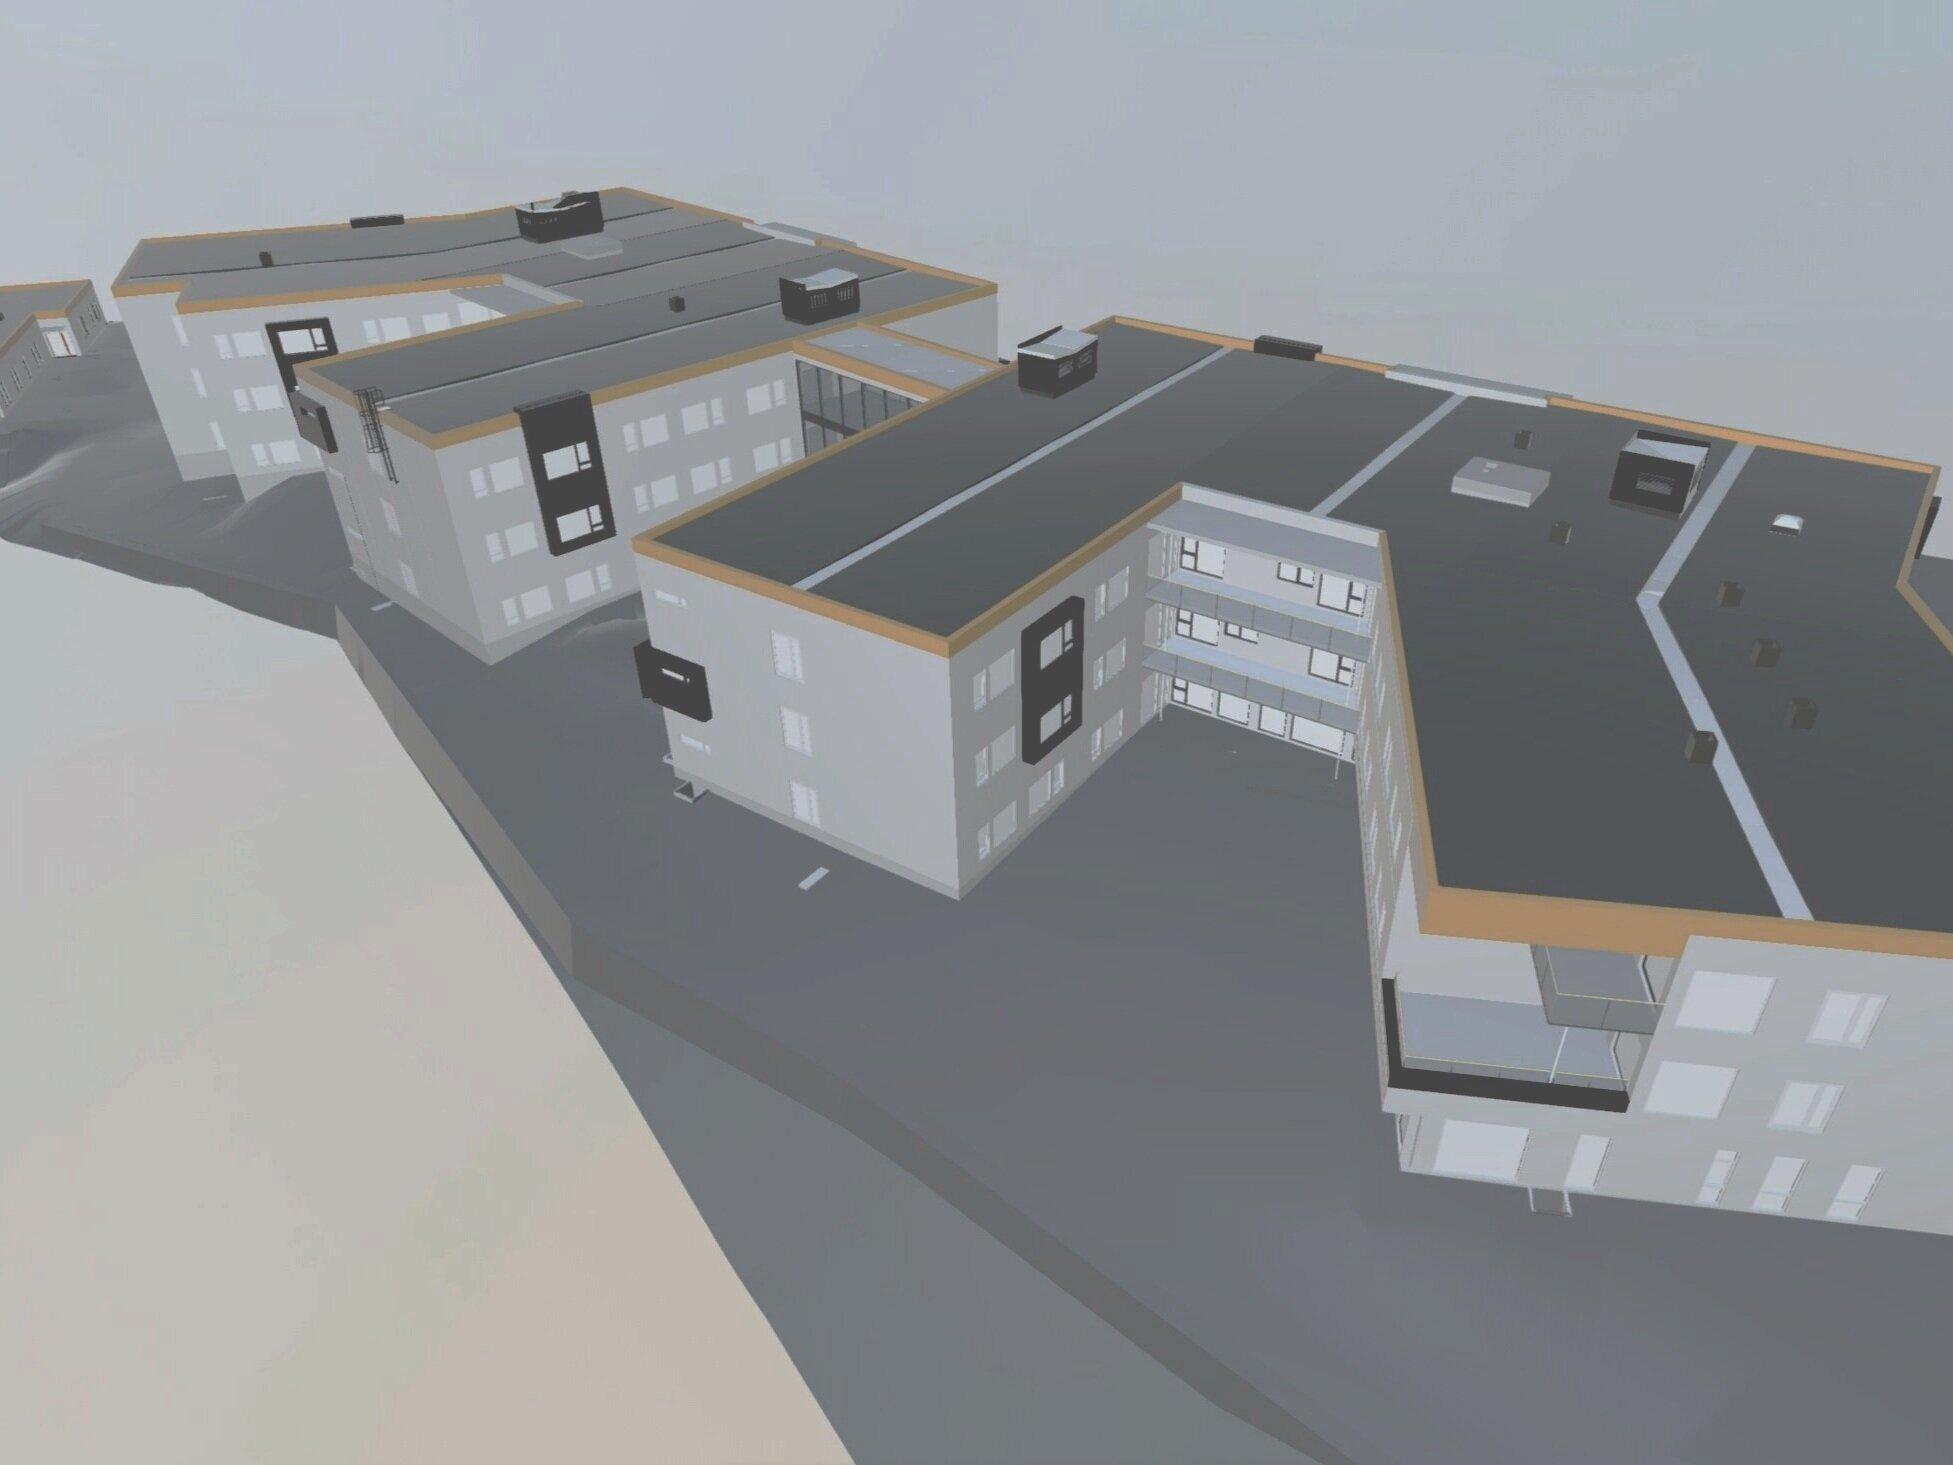 Lindelia Bo - 15.000 m2